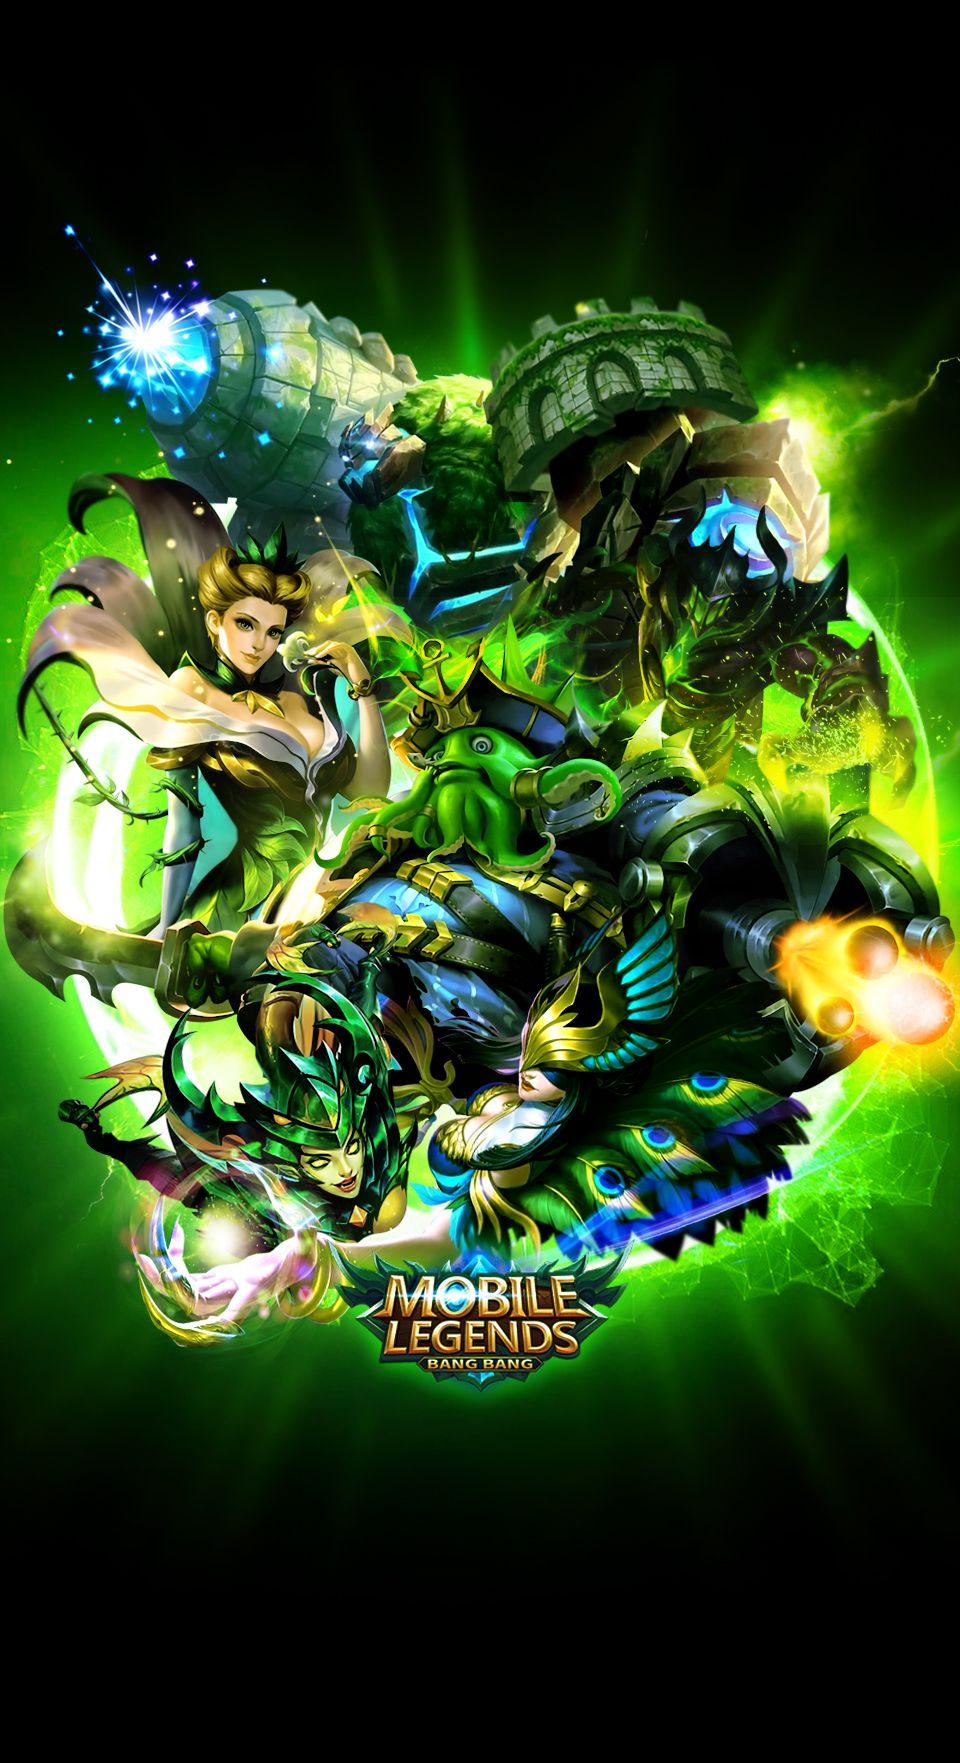 Team Green Mobile Legends Mobile Legends Wallpaper Pinterest